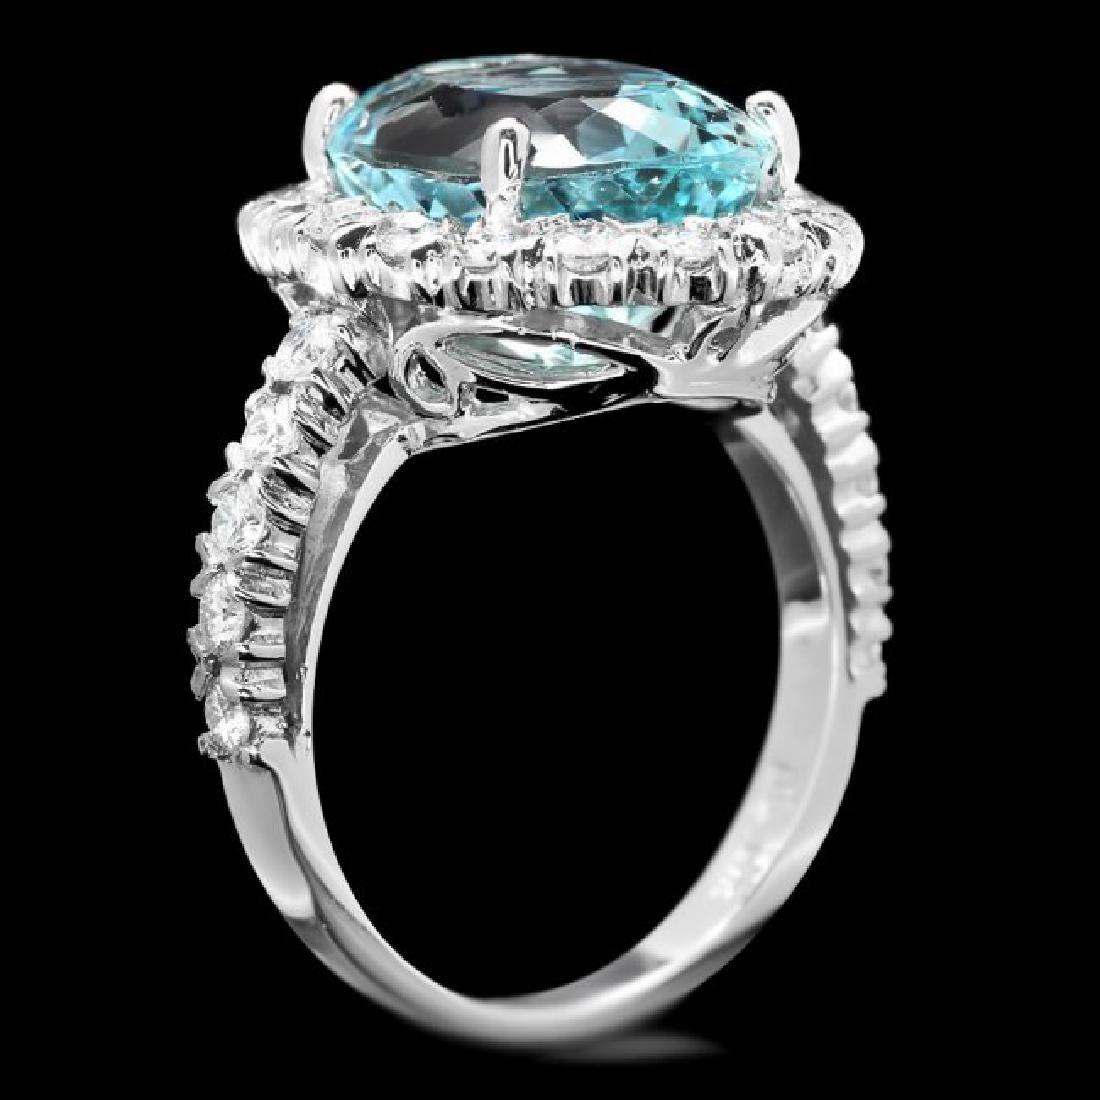 14k Gold 7.70ct Aquamarine 1.27ct Diamond Ring - 3